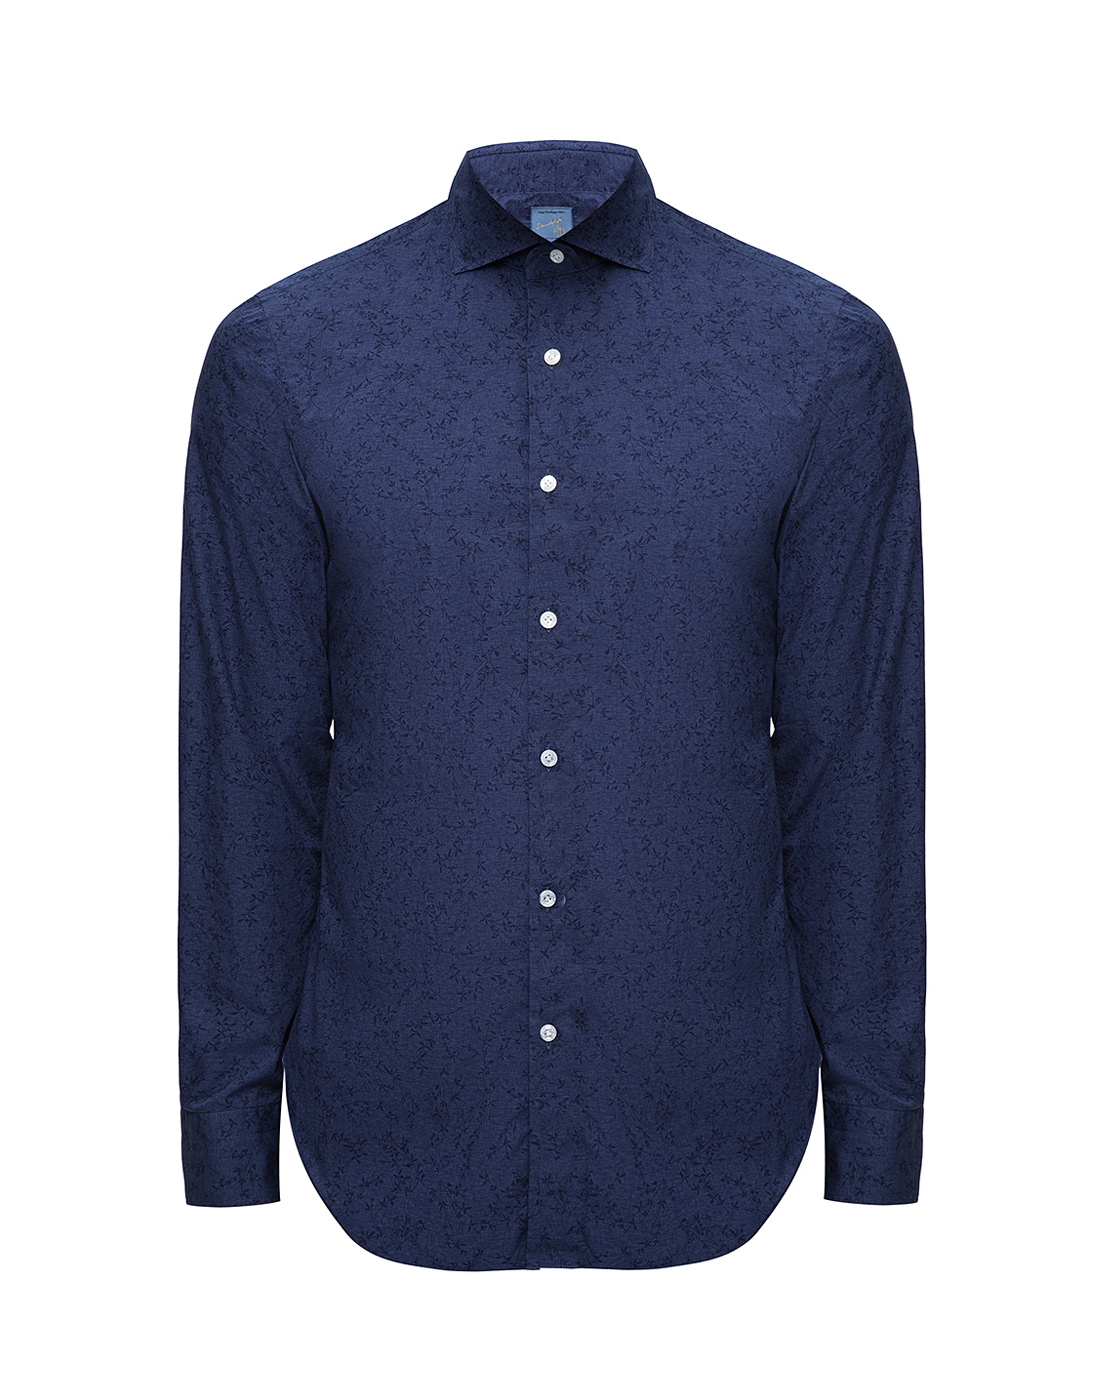 Мужская синяя рубашка Barba S554801U-1